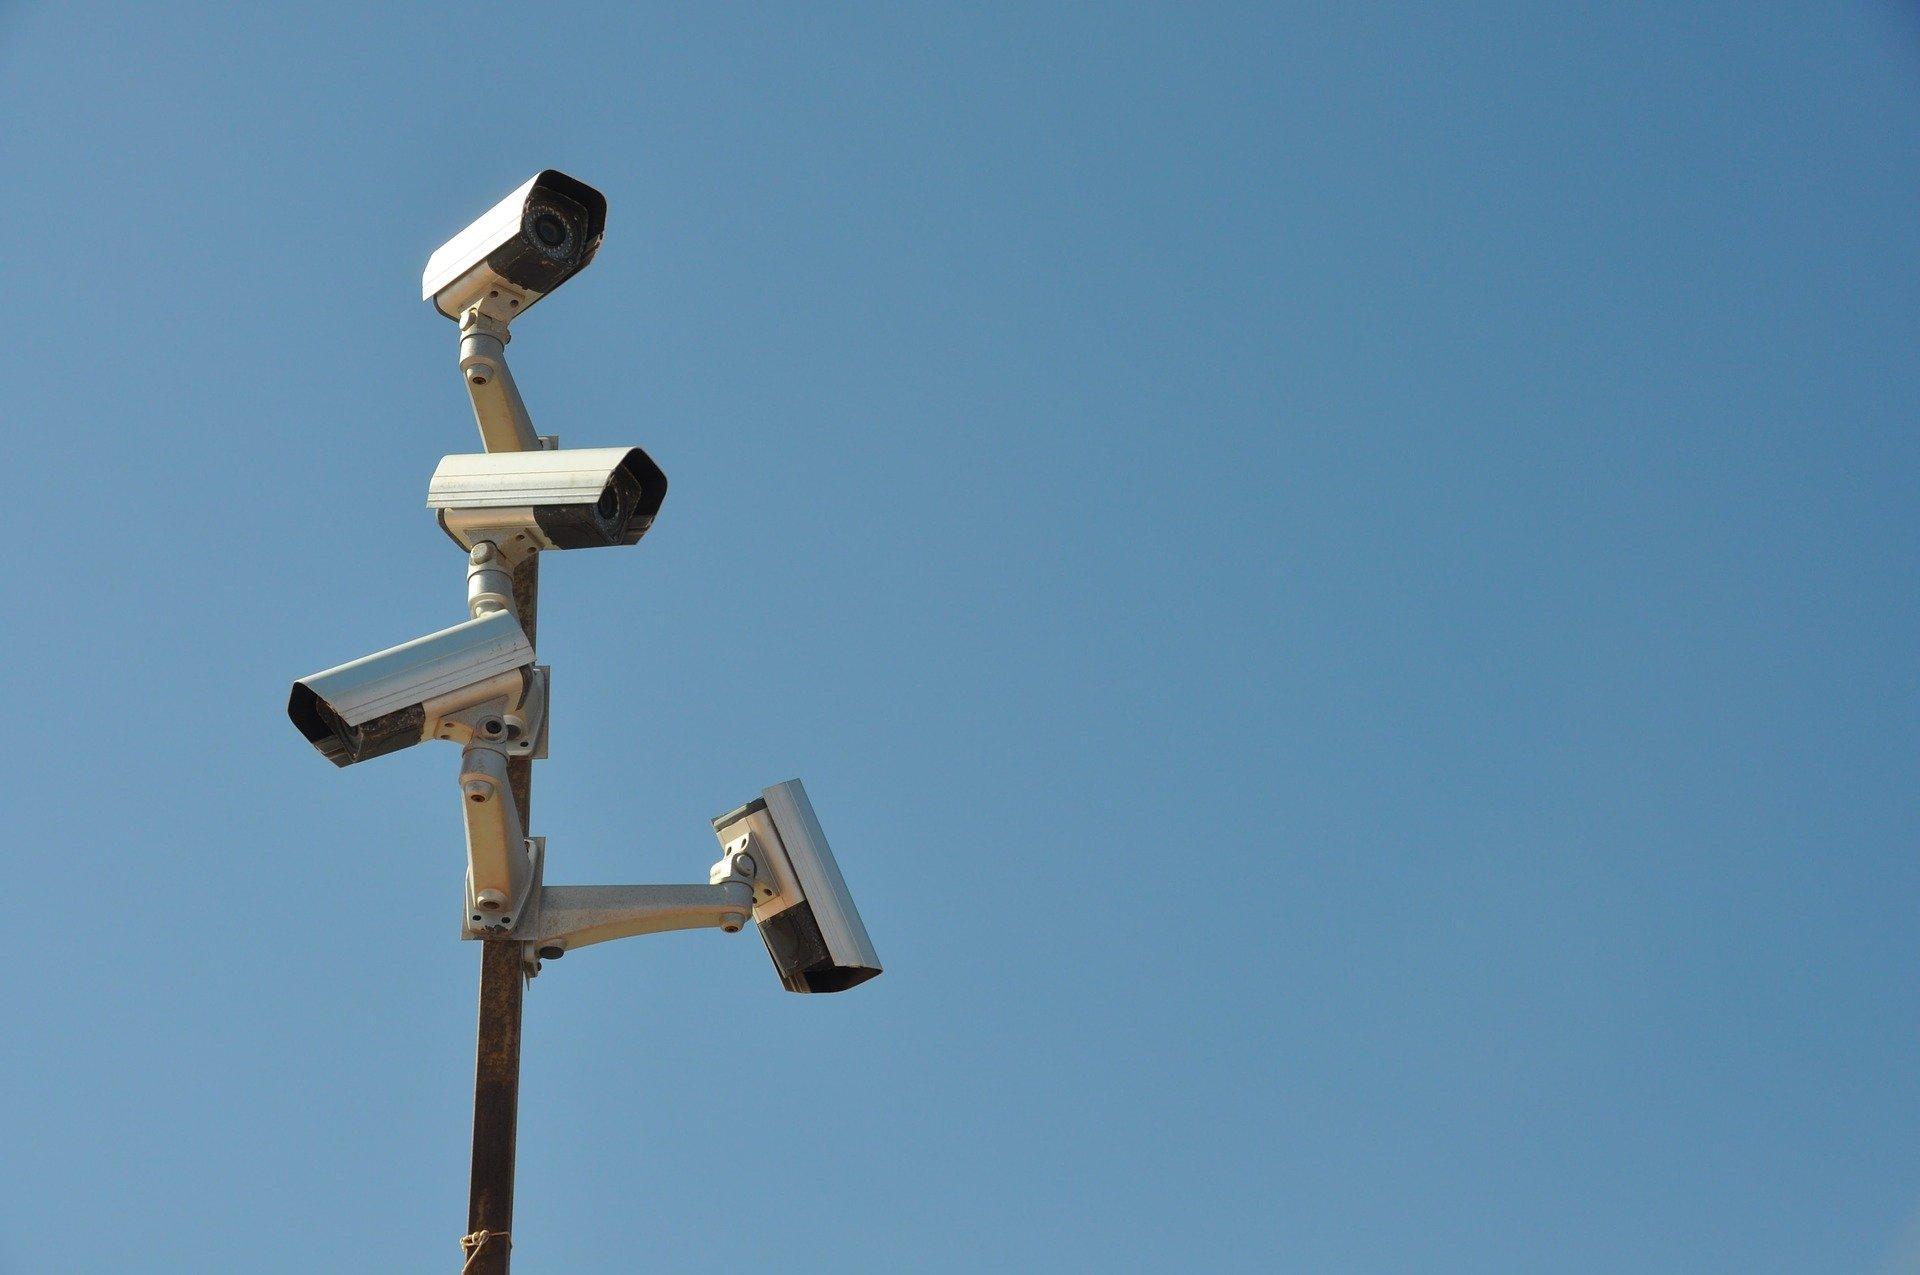 KI-gestützte Videoüberwachung am Europaplatz – Nein danke.